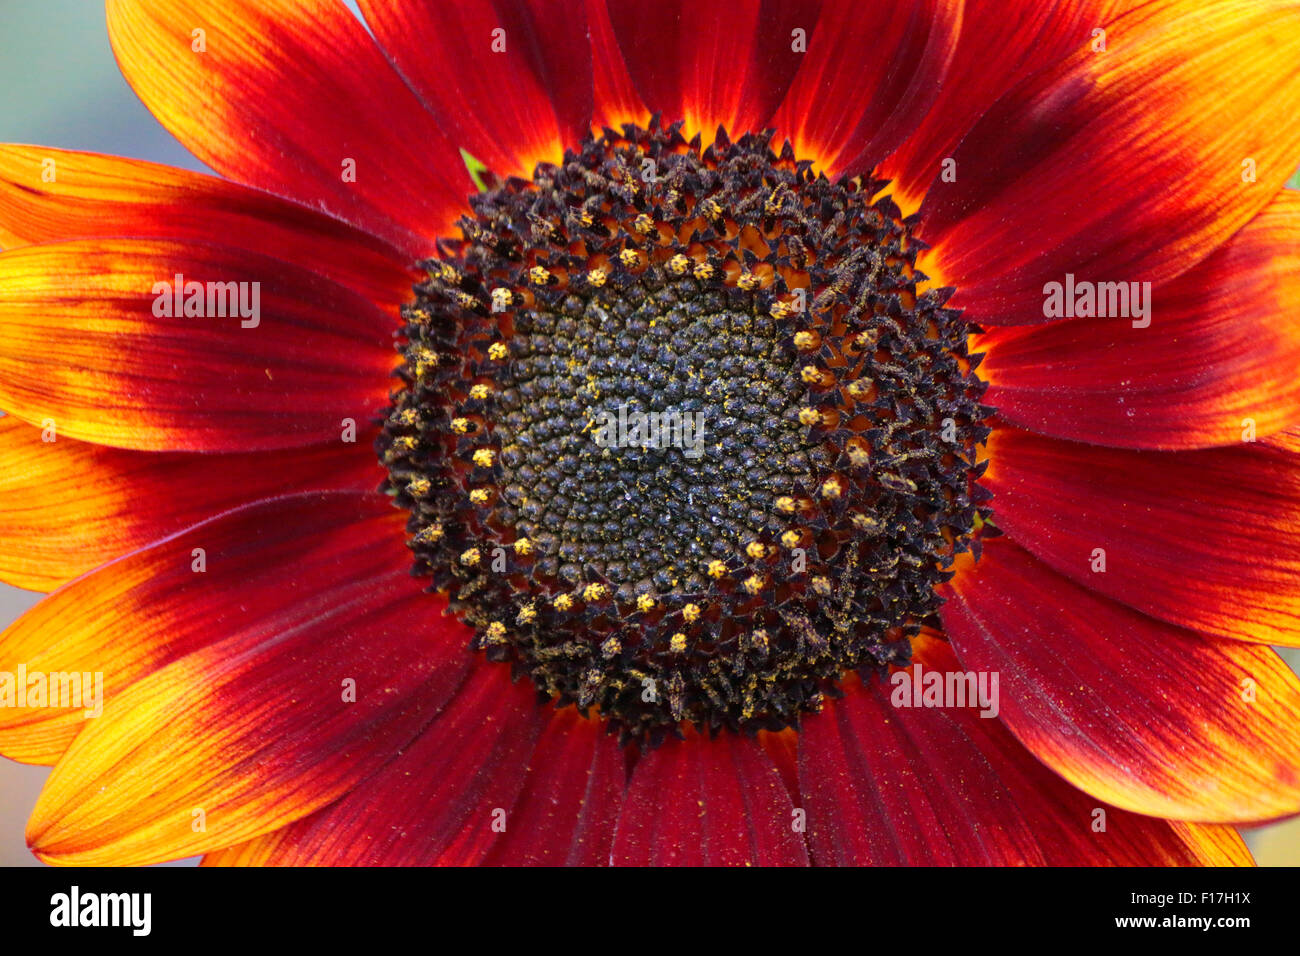 Sonneblume, Garten, Berlin. - Stock Image